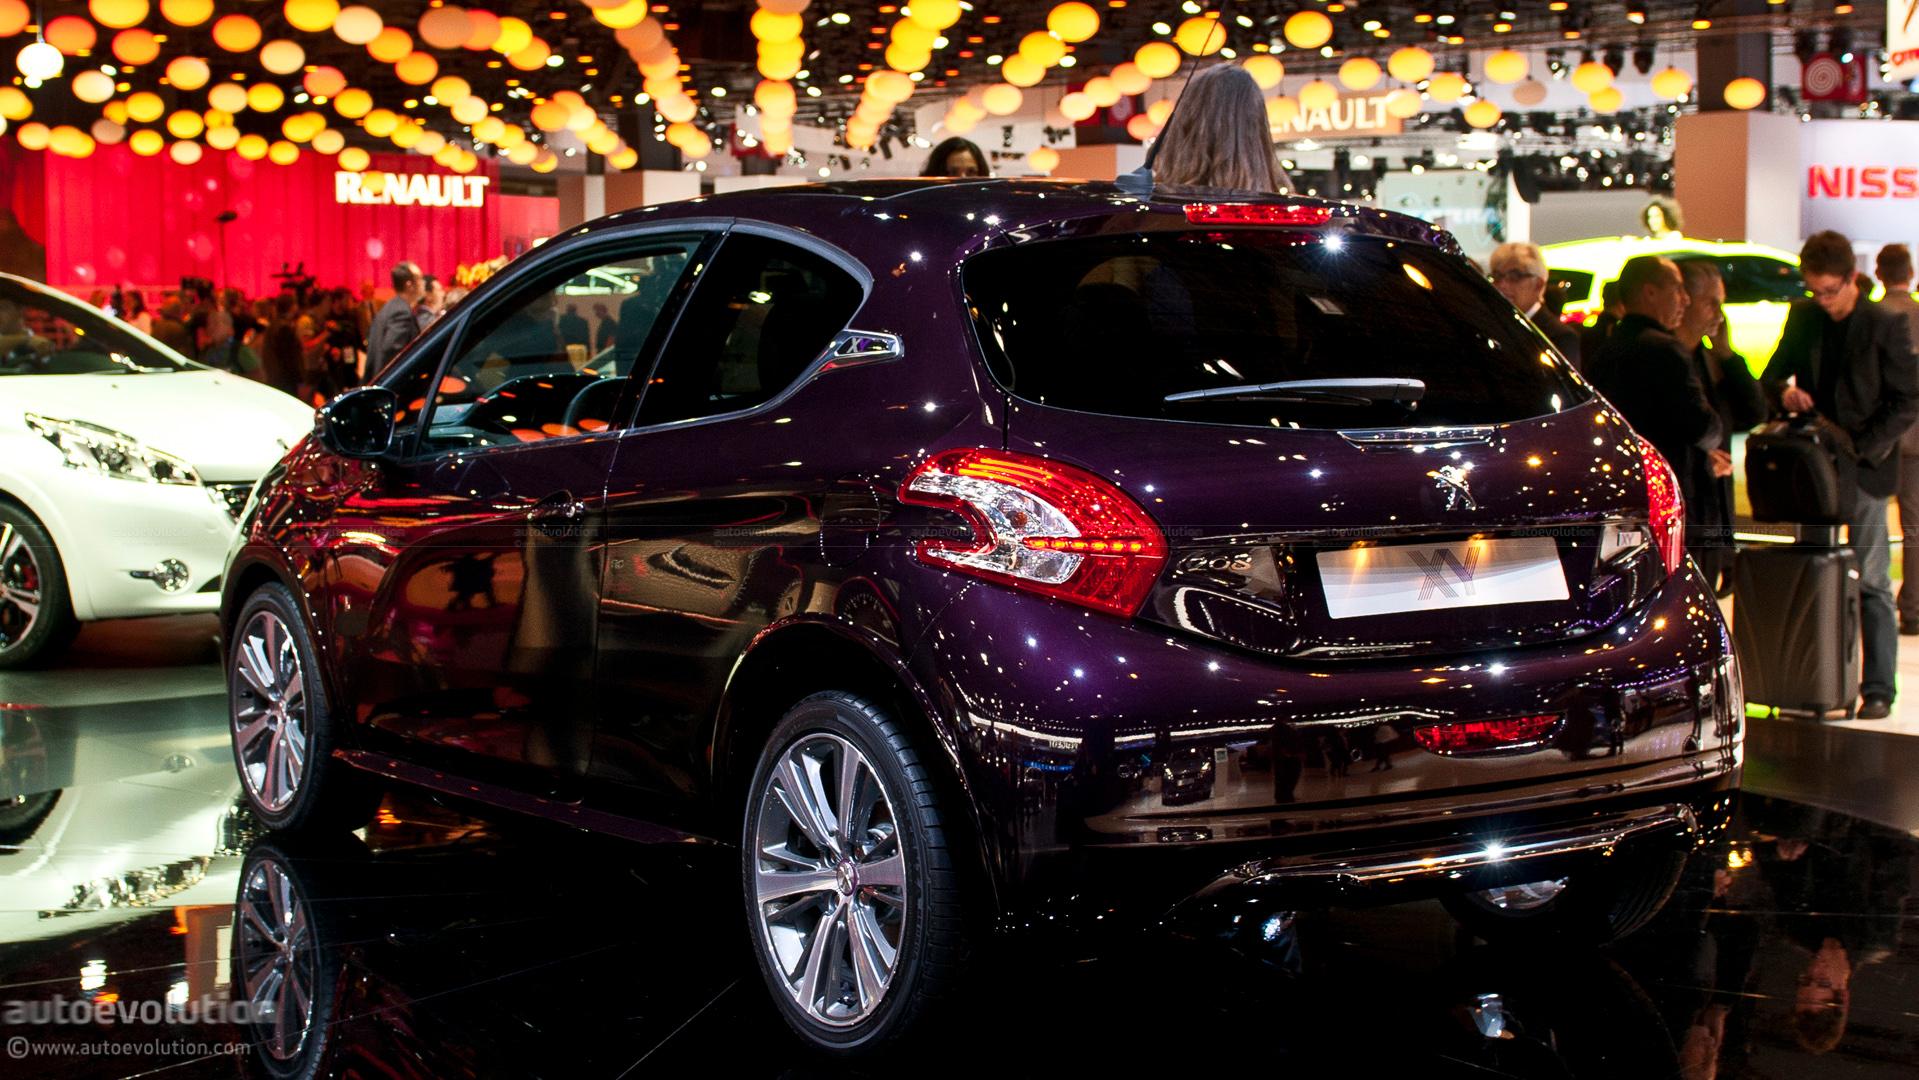 All Star Hyundai >> Paris 2012: Peugeot 208 XY [Live Photos] - autoevolution